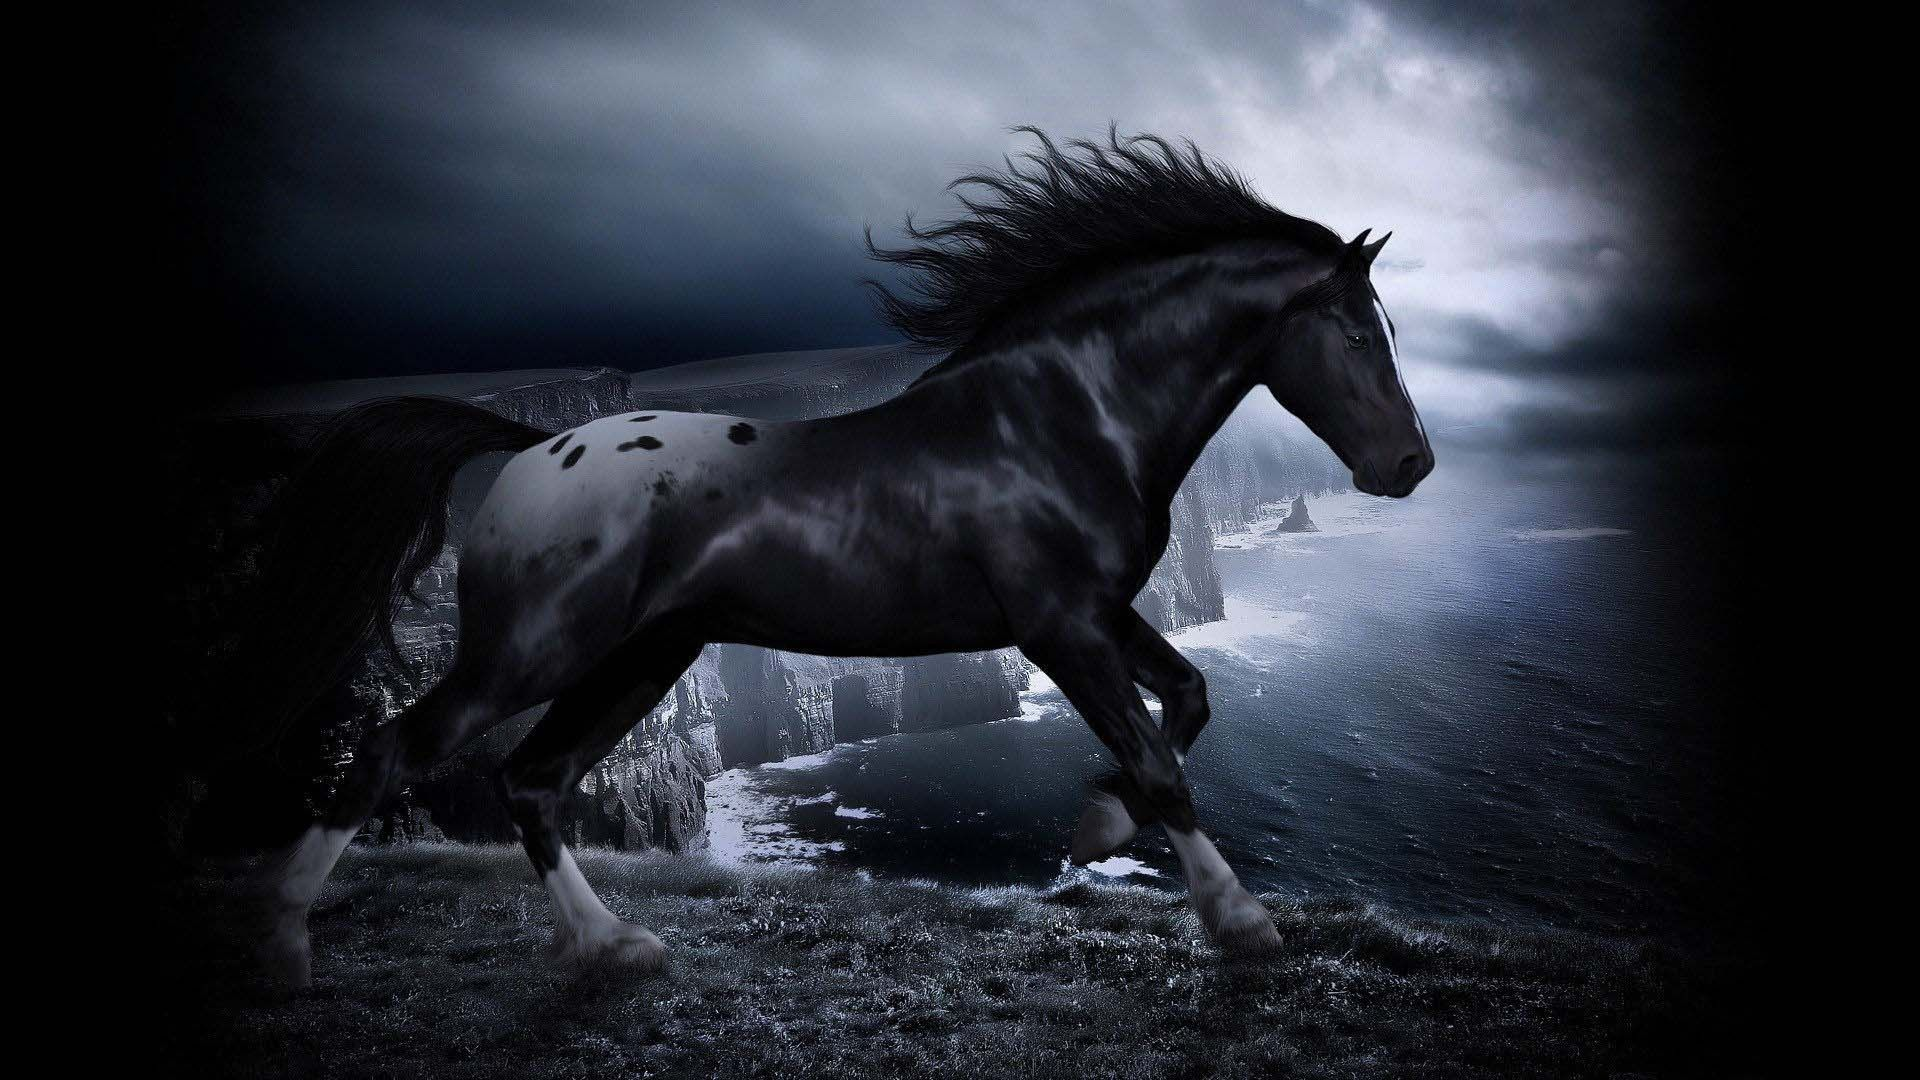 Cool Wallpaper Horse Beauty - 64ea31c9bf164f350b1ab97124c570de  Snapshot_3853.jpg